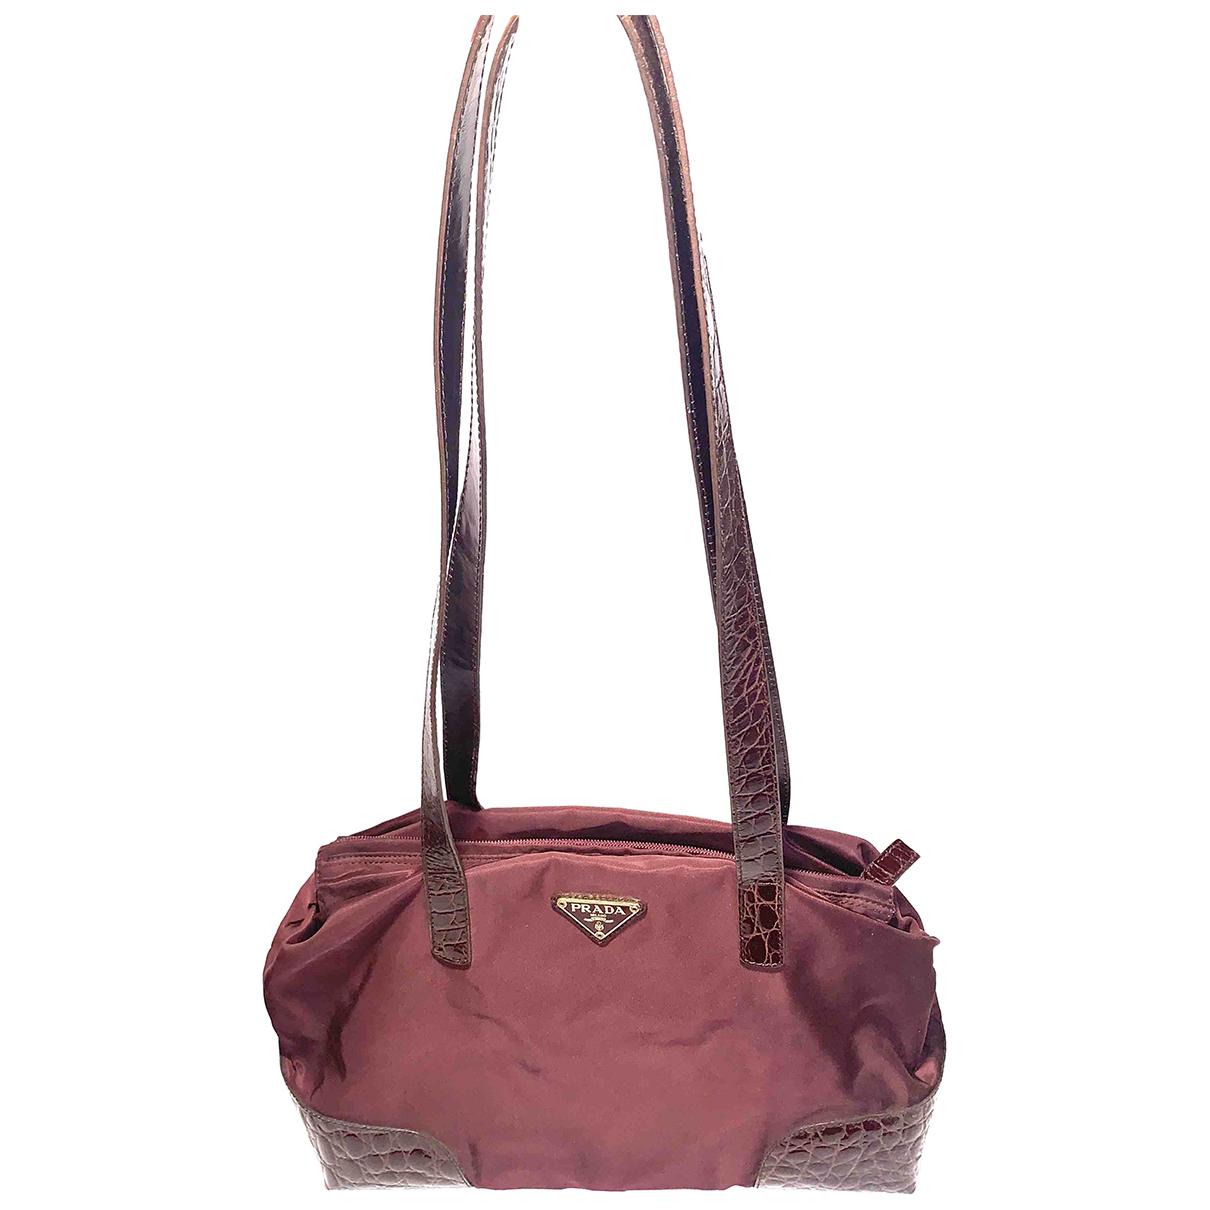 Prada Re-Nylon Burgundy Cloth handbag for Women N